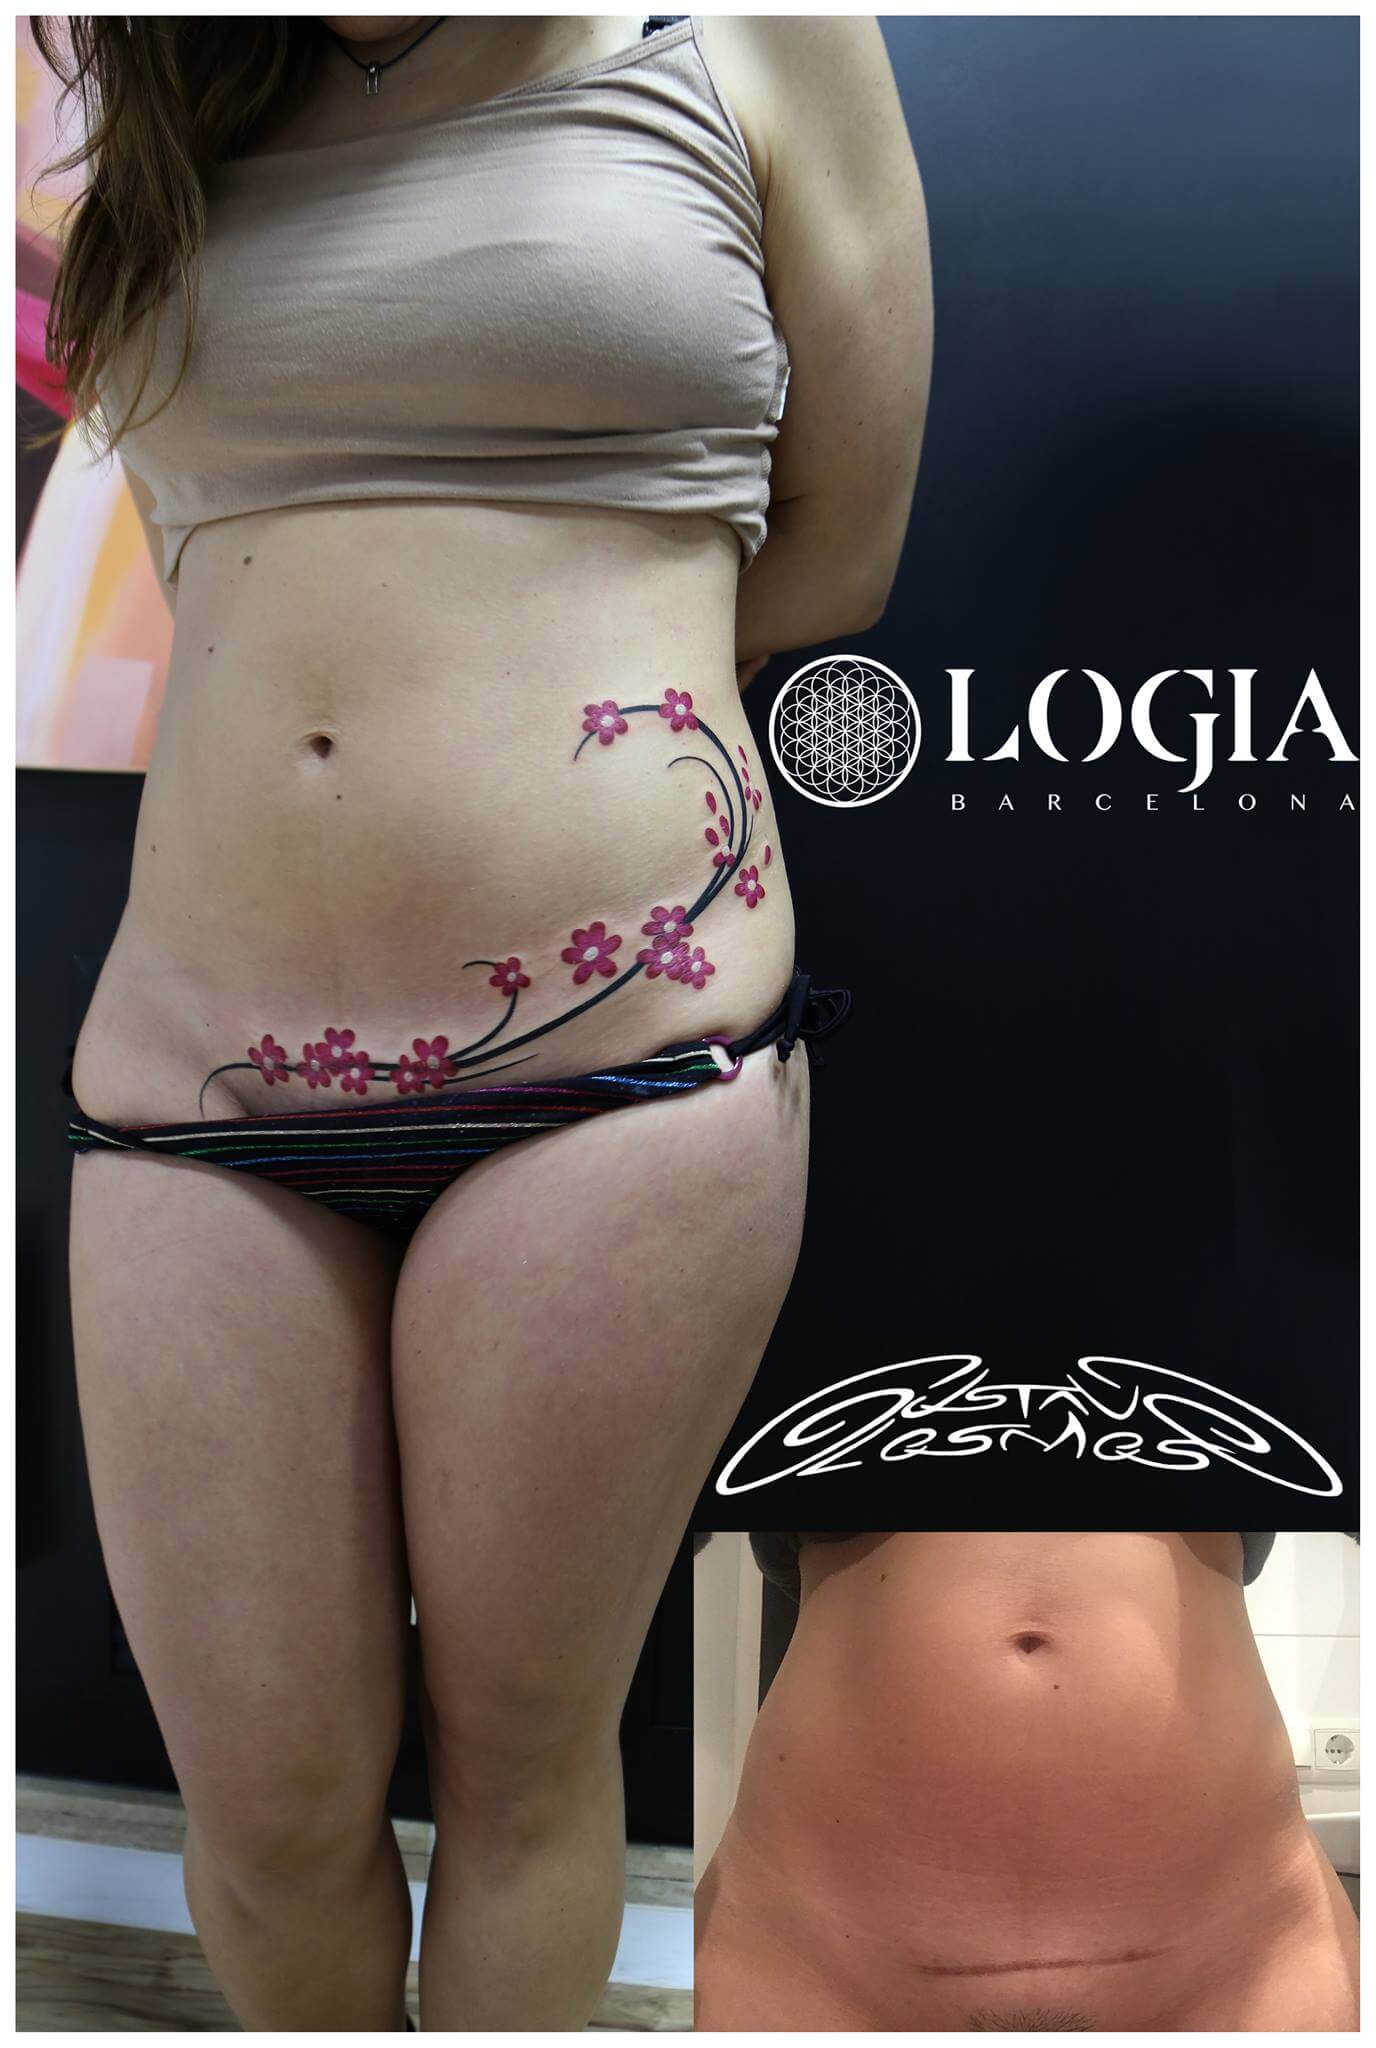 Tatuajes en zonas íntimas para mujeres - Logia Tattoo